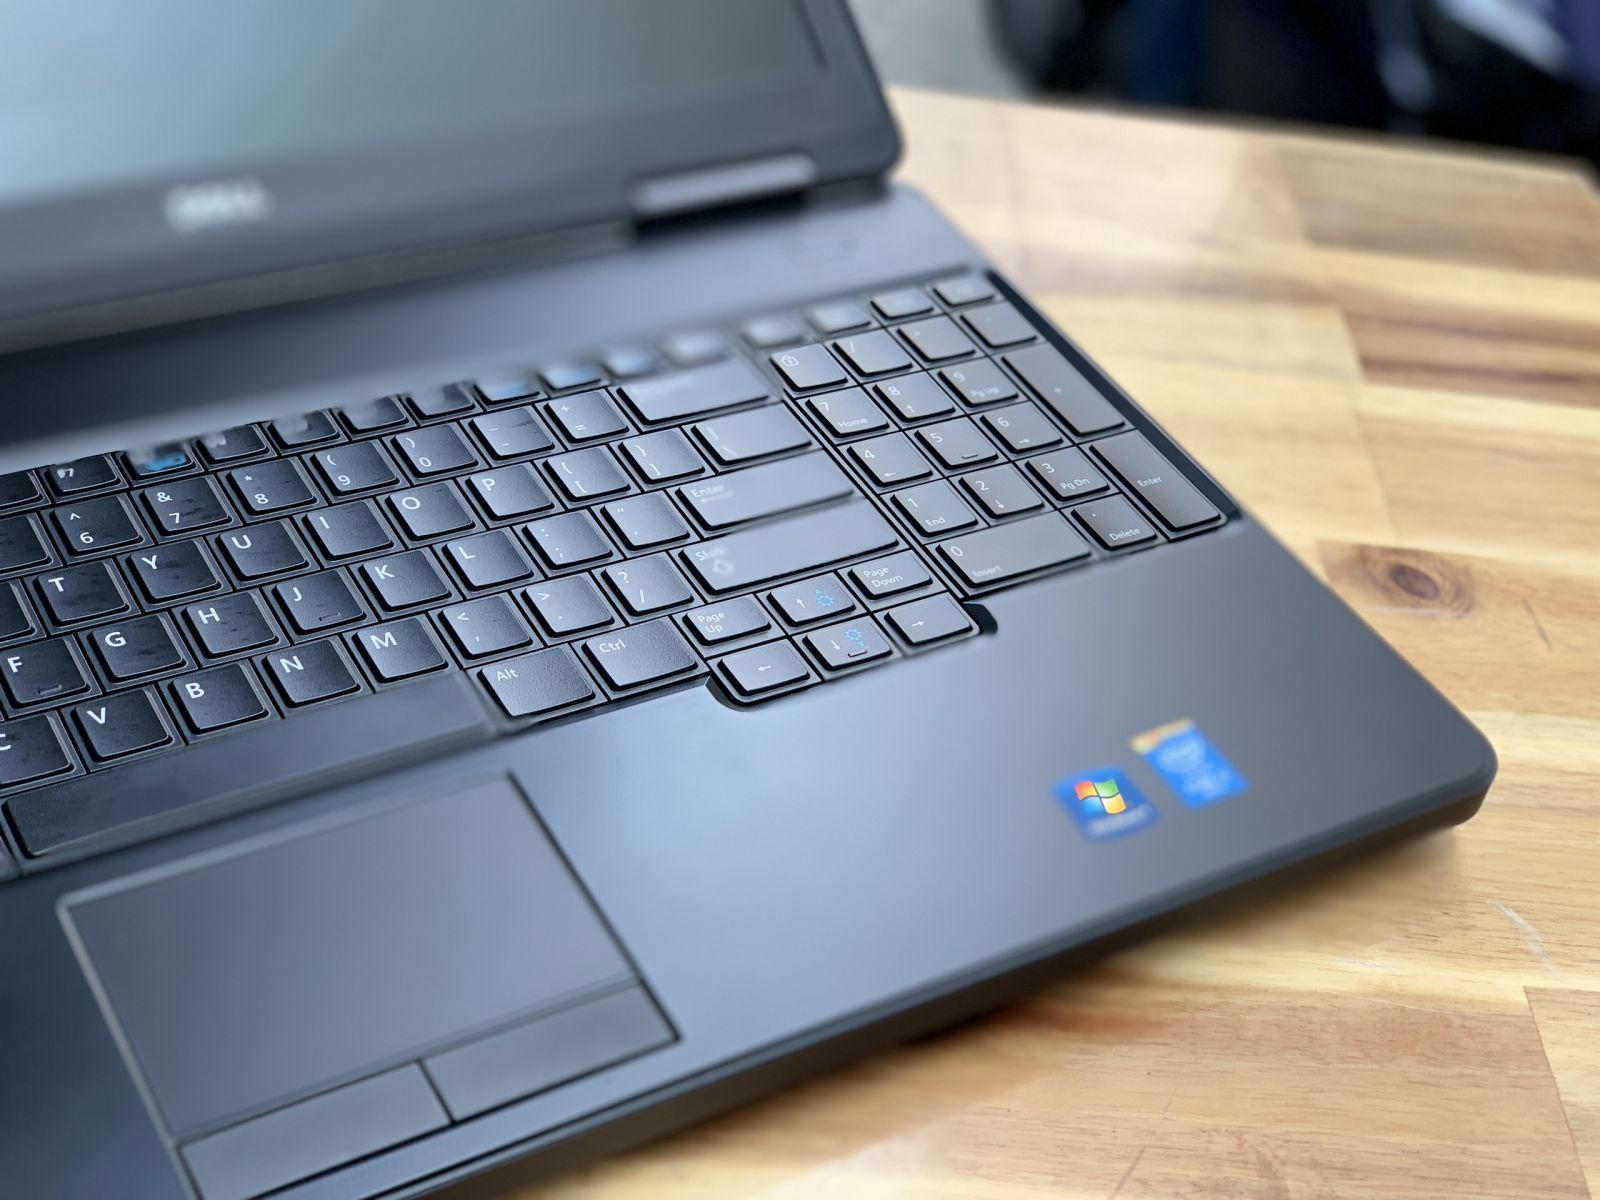 Dell Latitude E5540 i5 đẹp zin giá rẻ